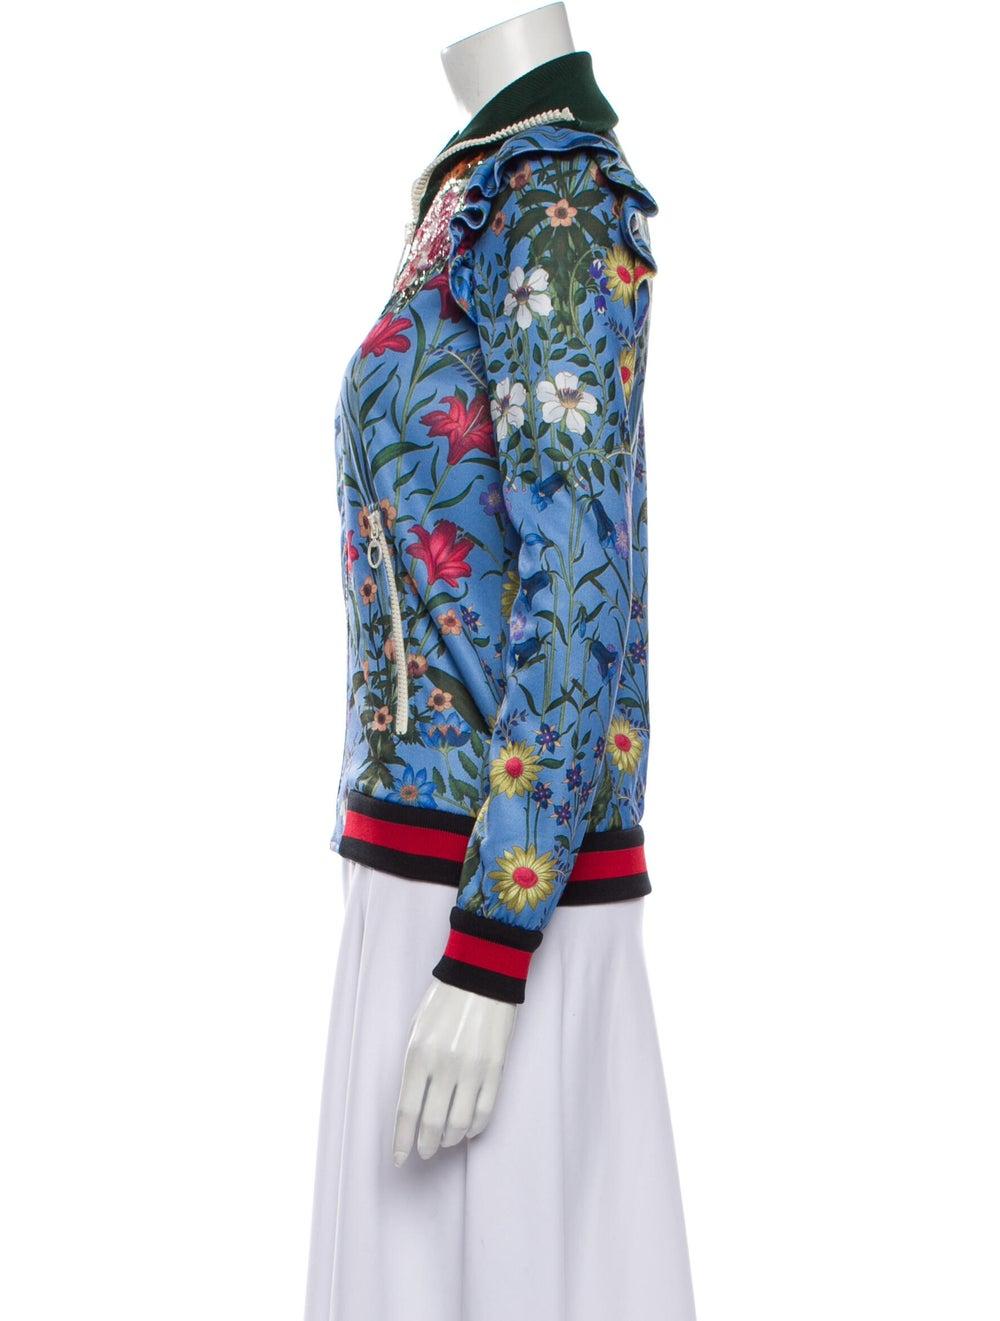 Gucci Floral Print Bomber Jacket Blue - image 2